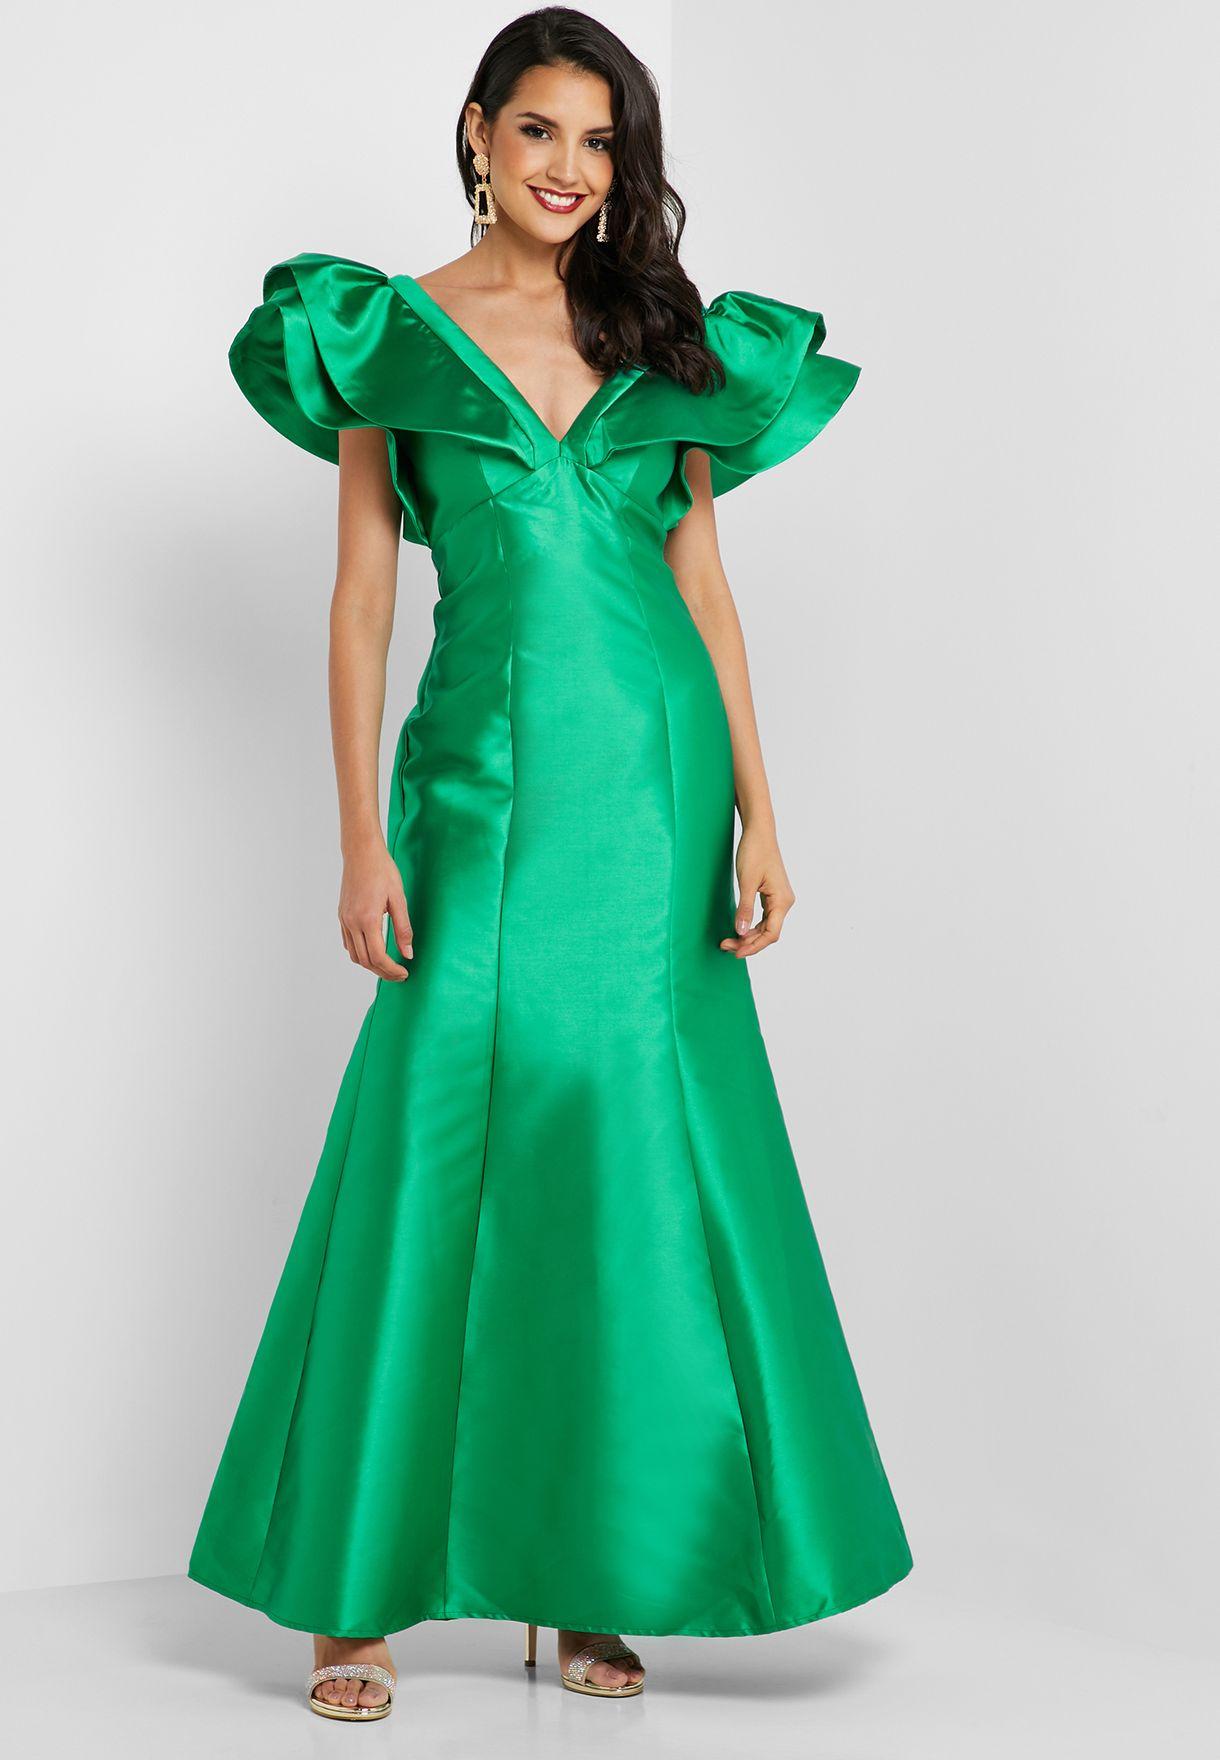 Layered Sleeve Plunge Dress